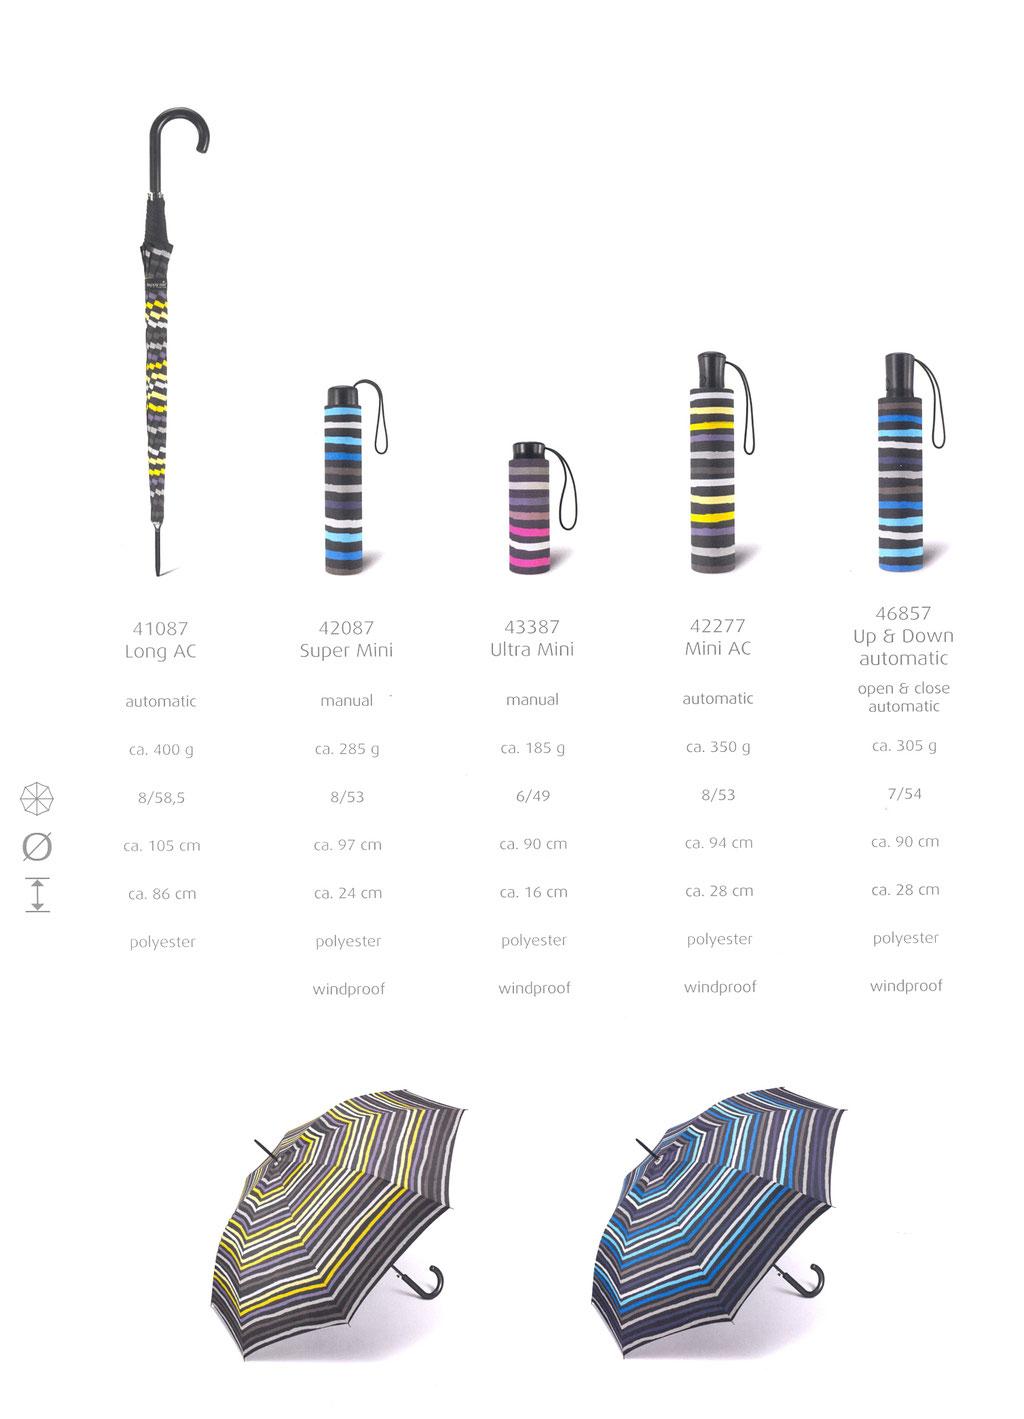 Essentials Fashion Stripes 41087 long 42087 Super Mini 43387 Ultra Mini 42277 Mini auto 46857 Up & Down